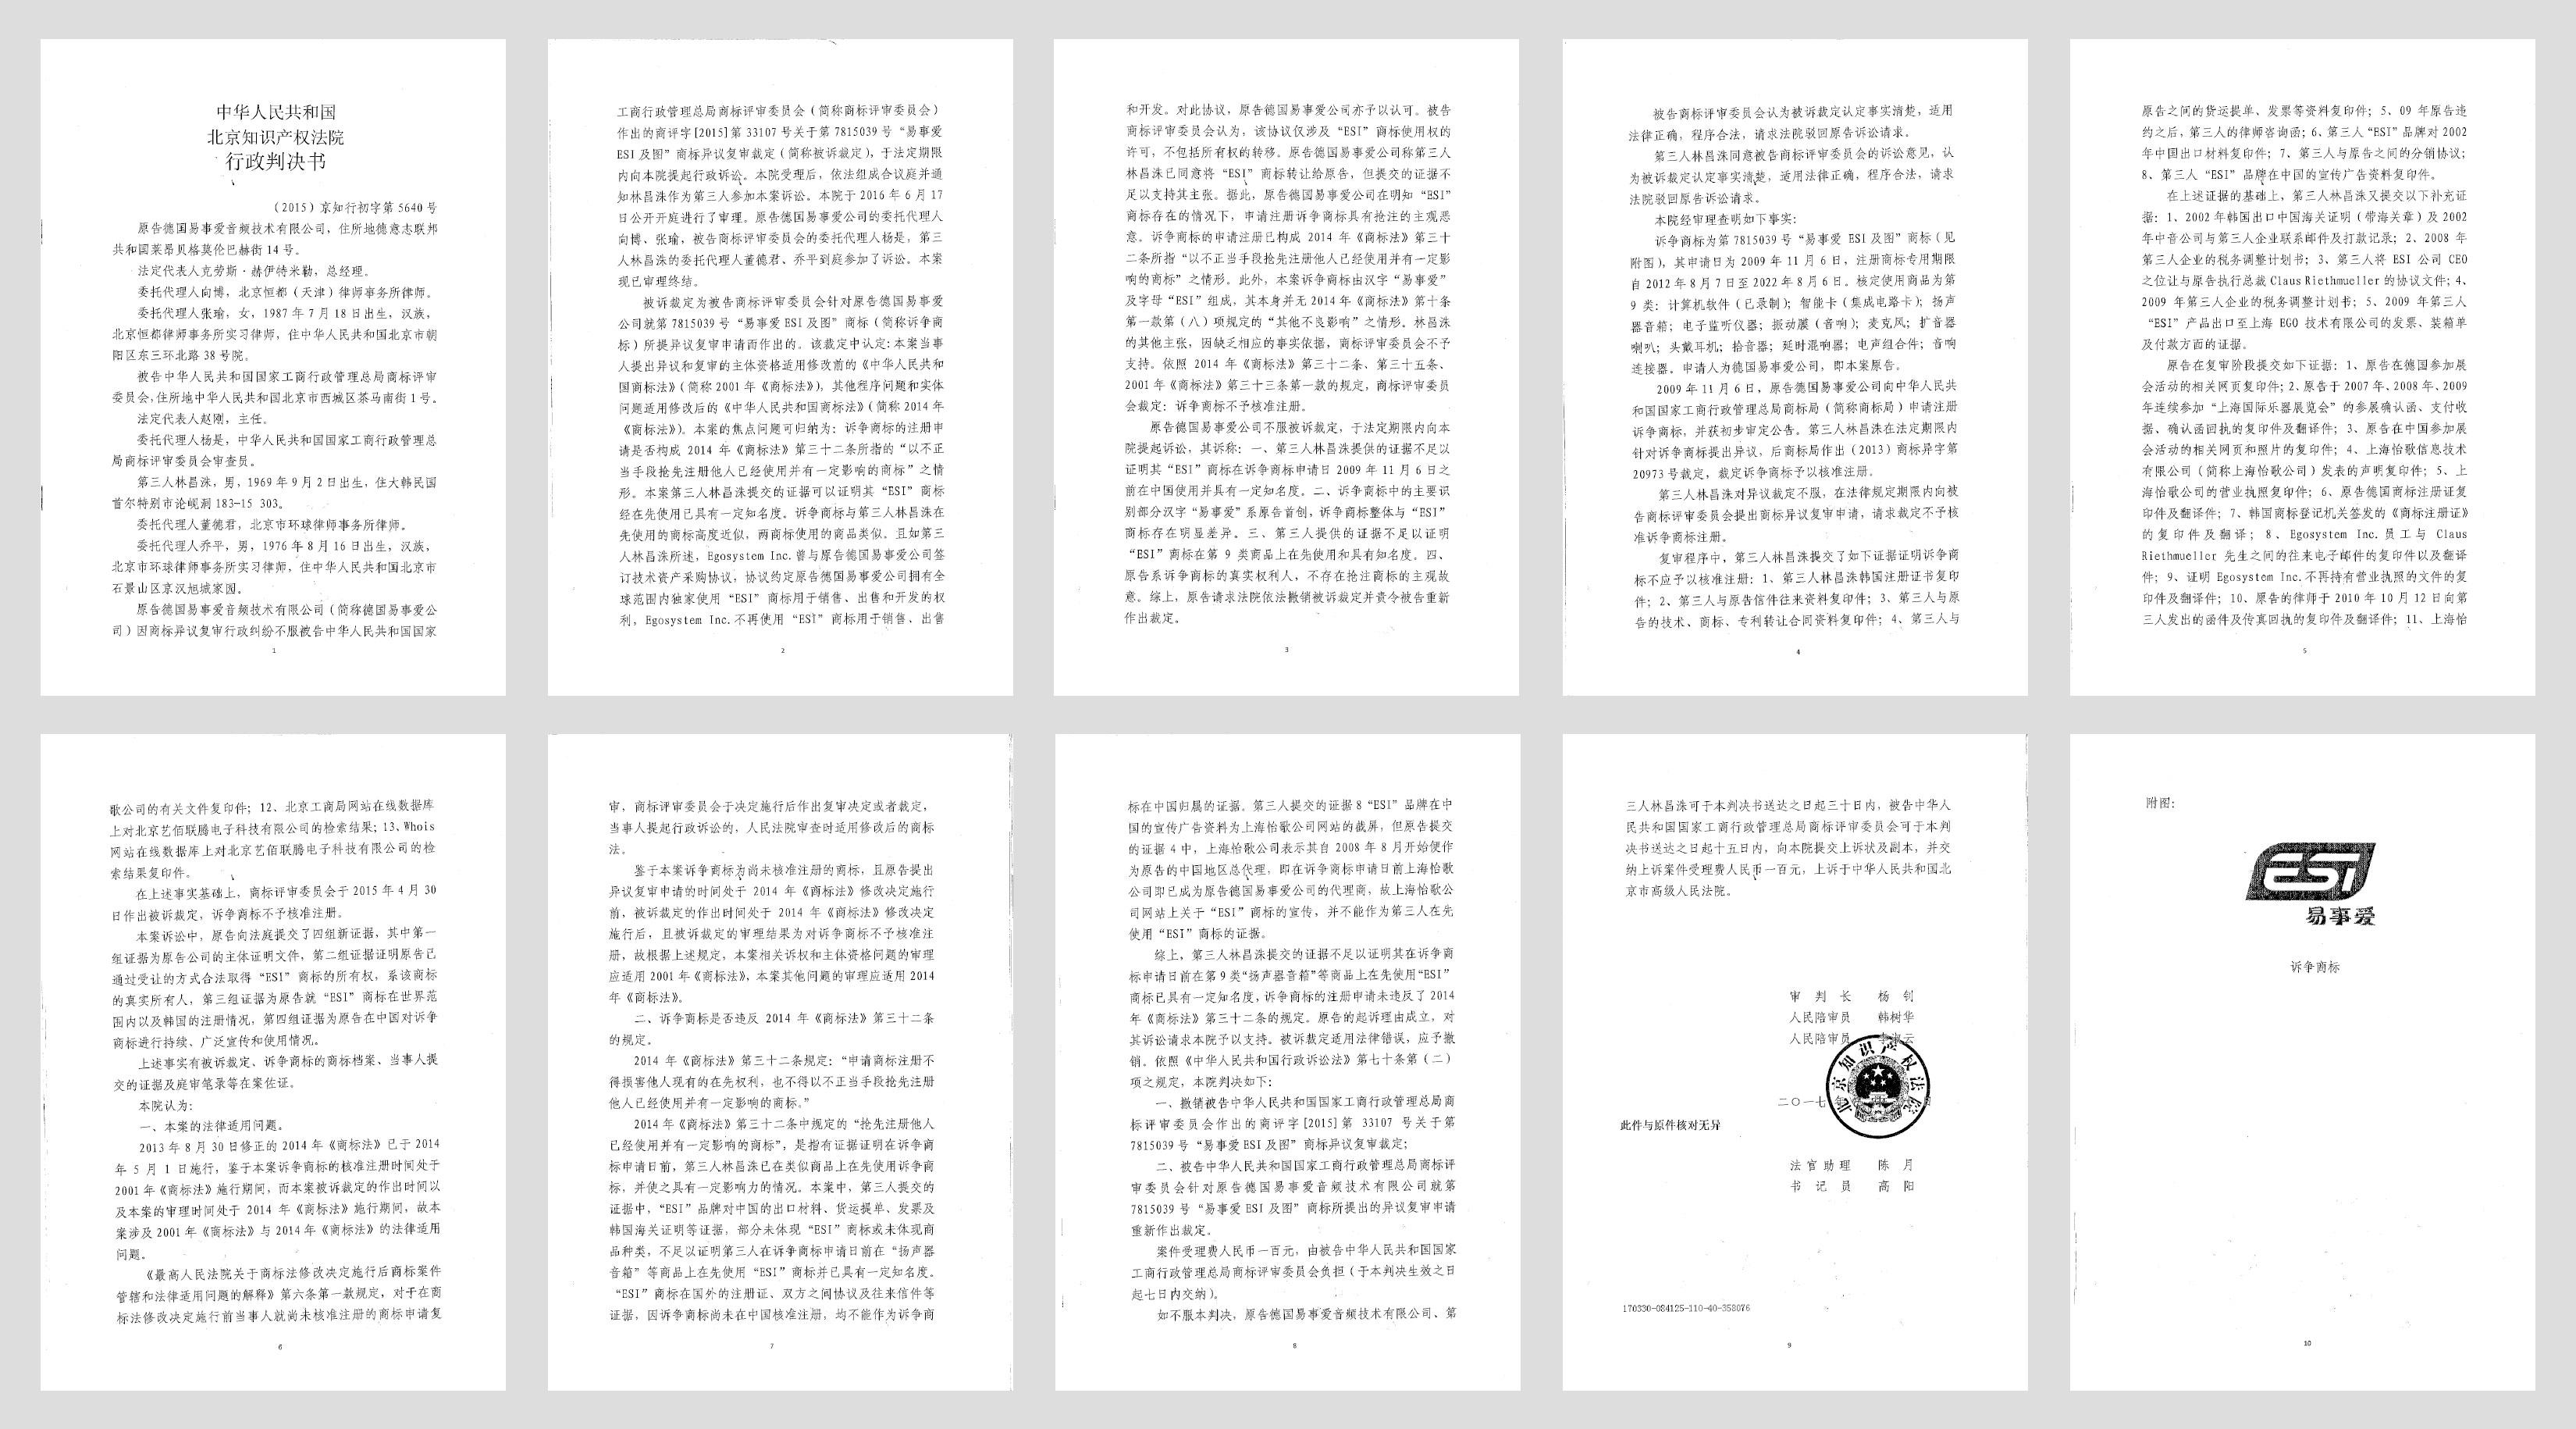 ESI 德国公司获得中国商标知识法庭初审胜利